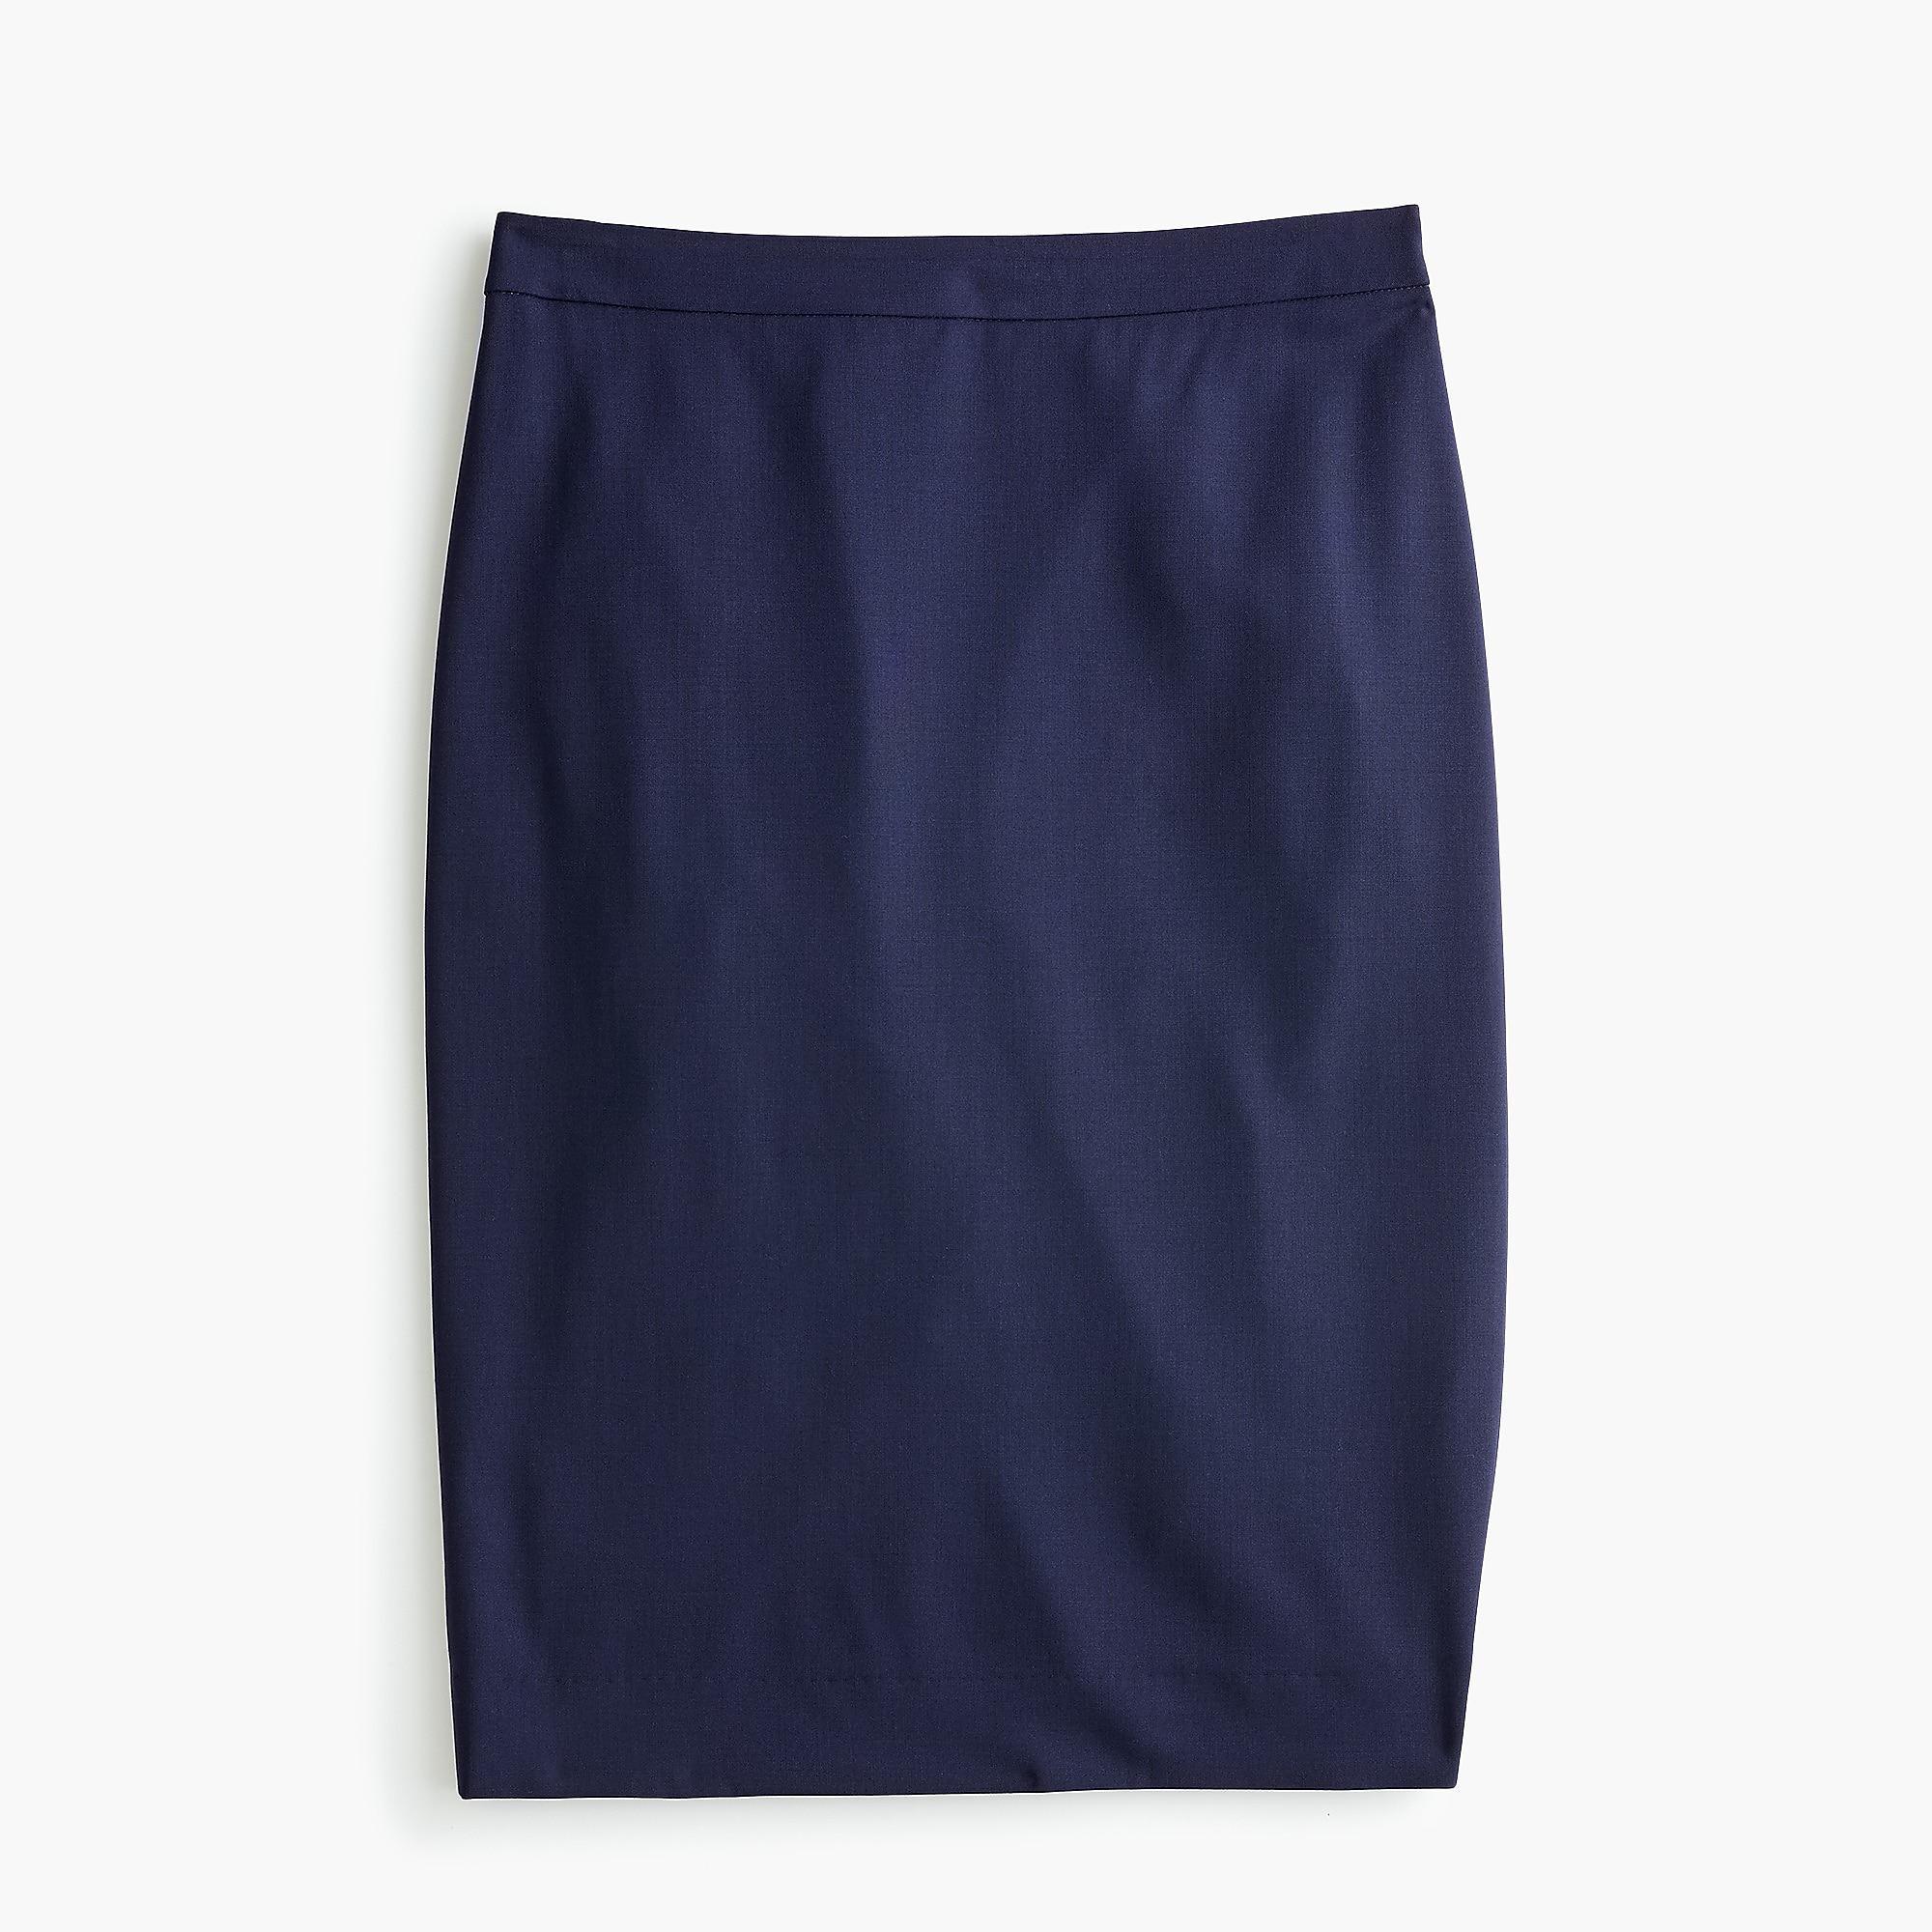 b5385c14b0 J.Crew - Blue Petite No. 2 Pencil Skirt In Italian Stretch Wool -. View  fullscreen